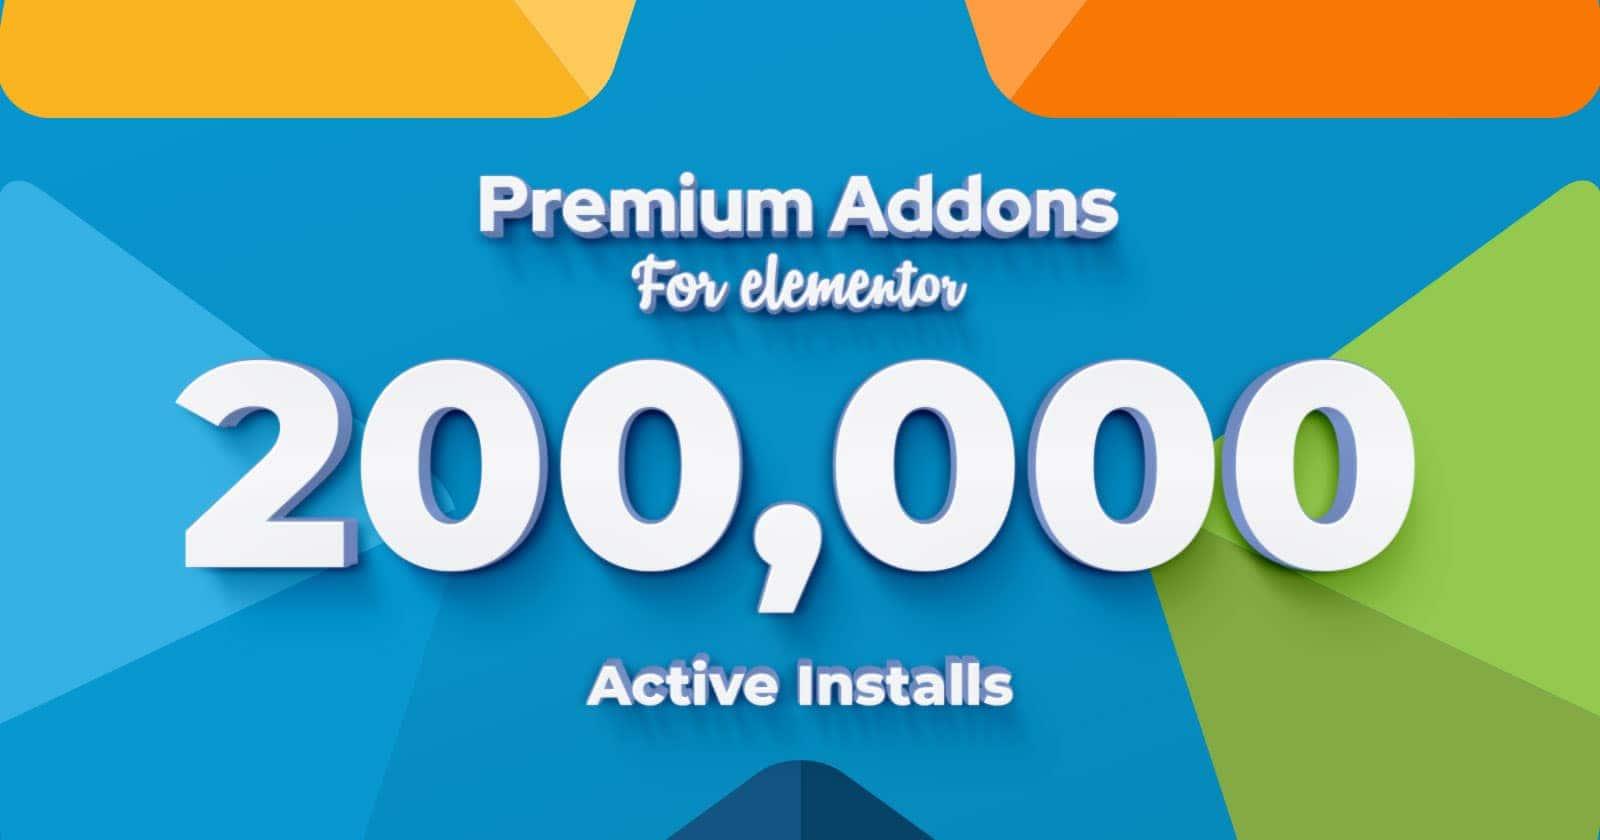 premium addons 200k users